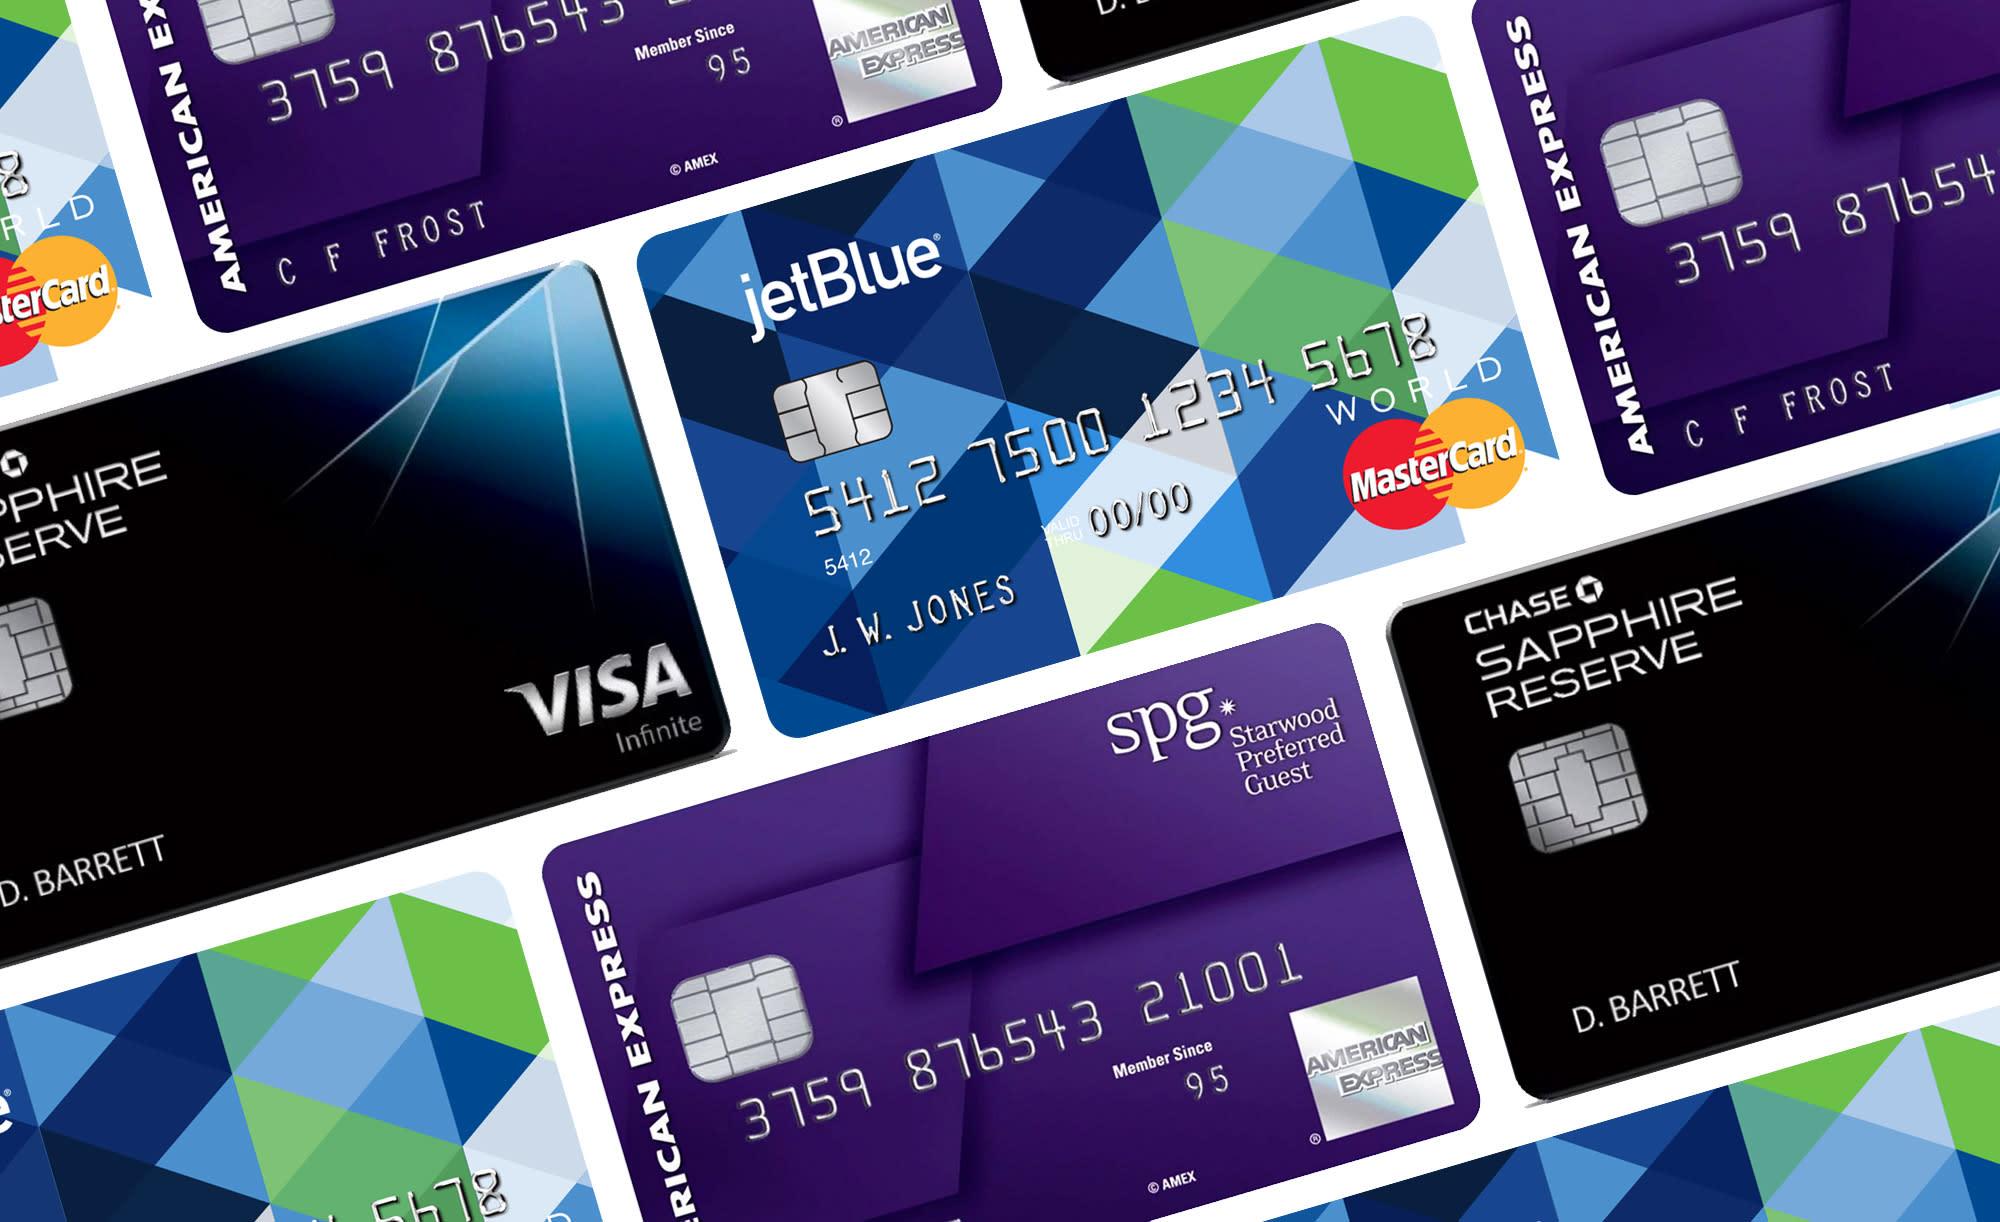 Best Travel Credit Cards Valuepenguin